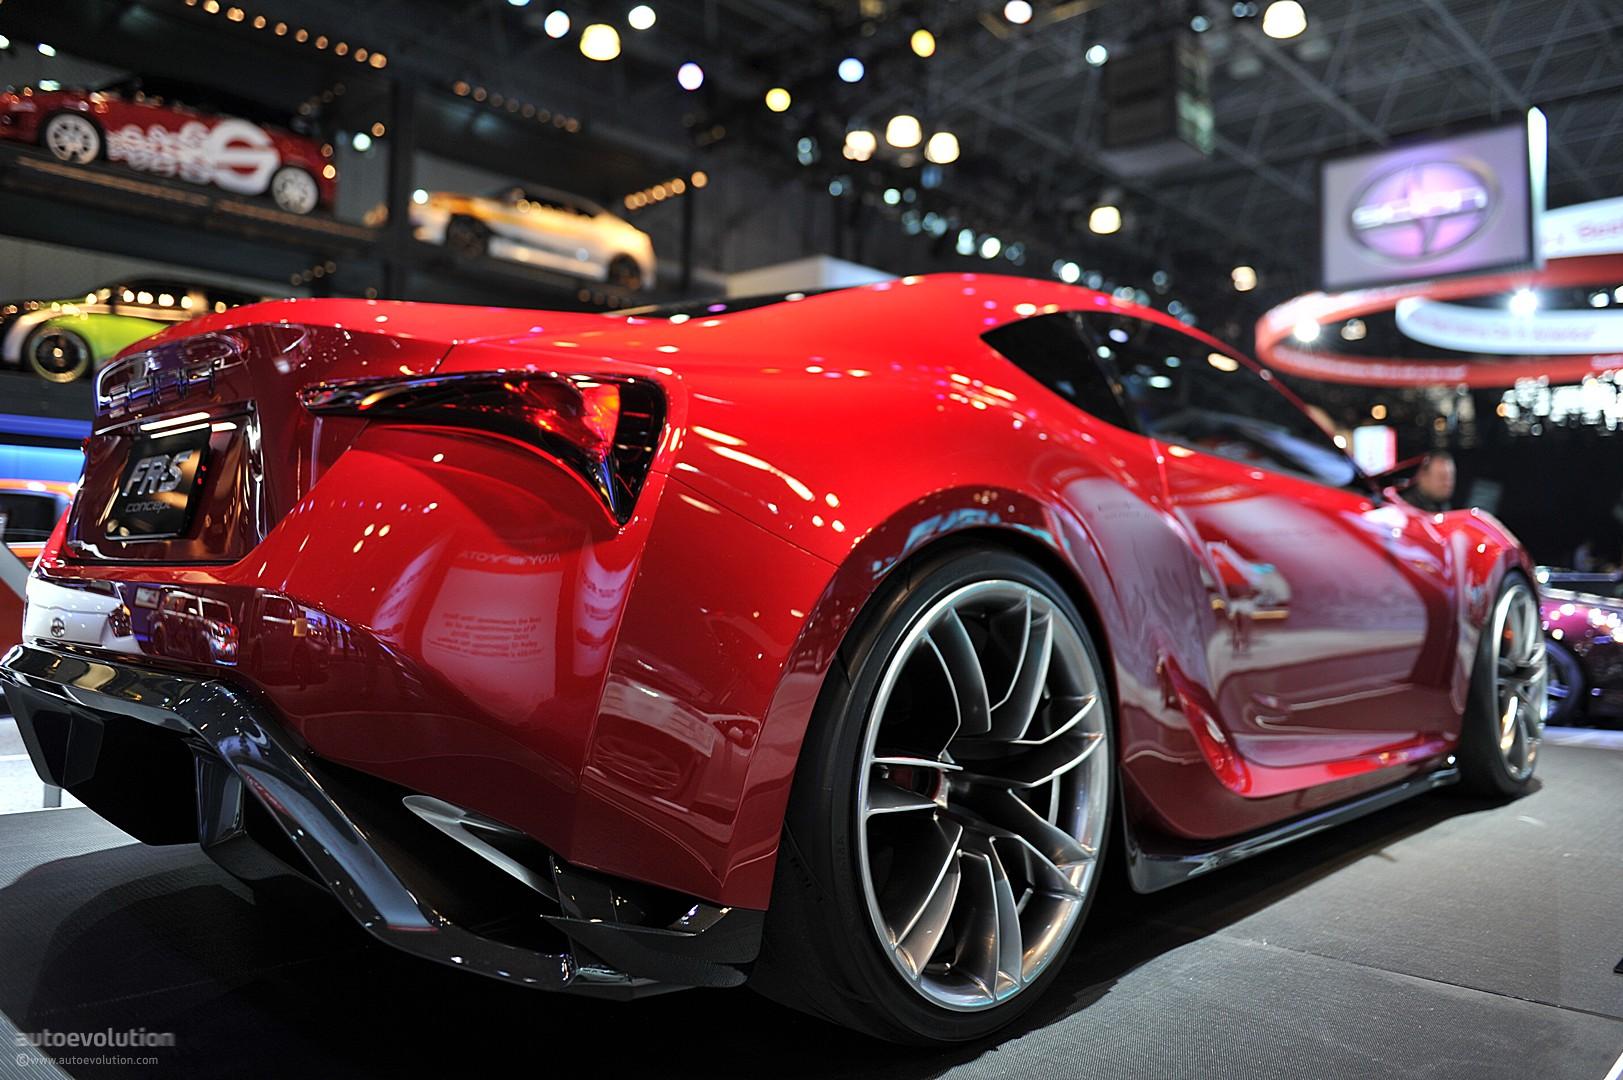 Modified Sports Car Wallpaper Nyias 2011 Scion Fr S Concept Live Photos Autoevolution